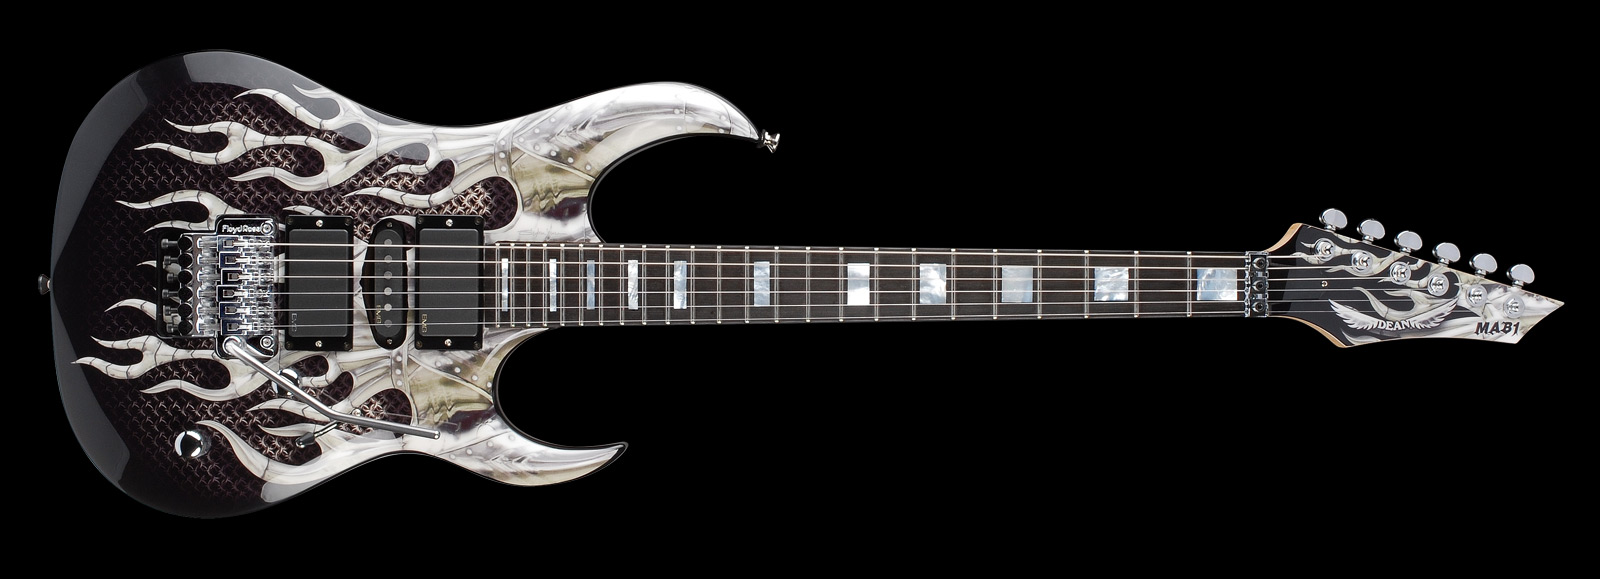 dean virtuosos de la guitarra tu recurso musical. Black Bedroom Furniture Sets. Home Design Ideas